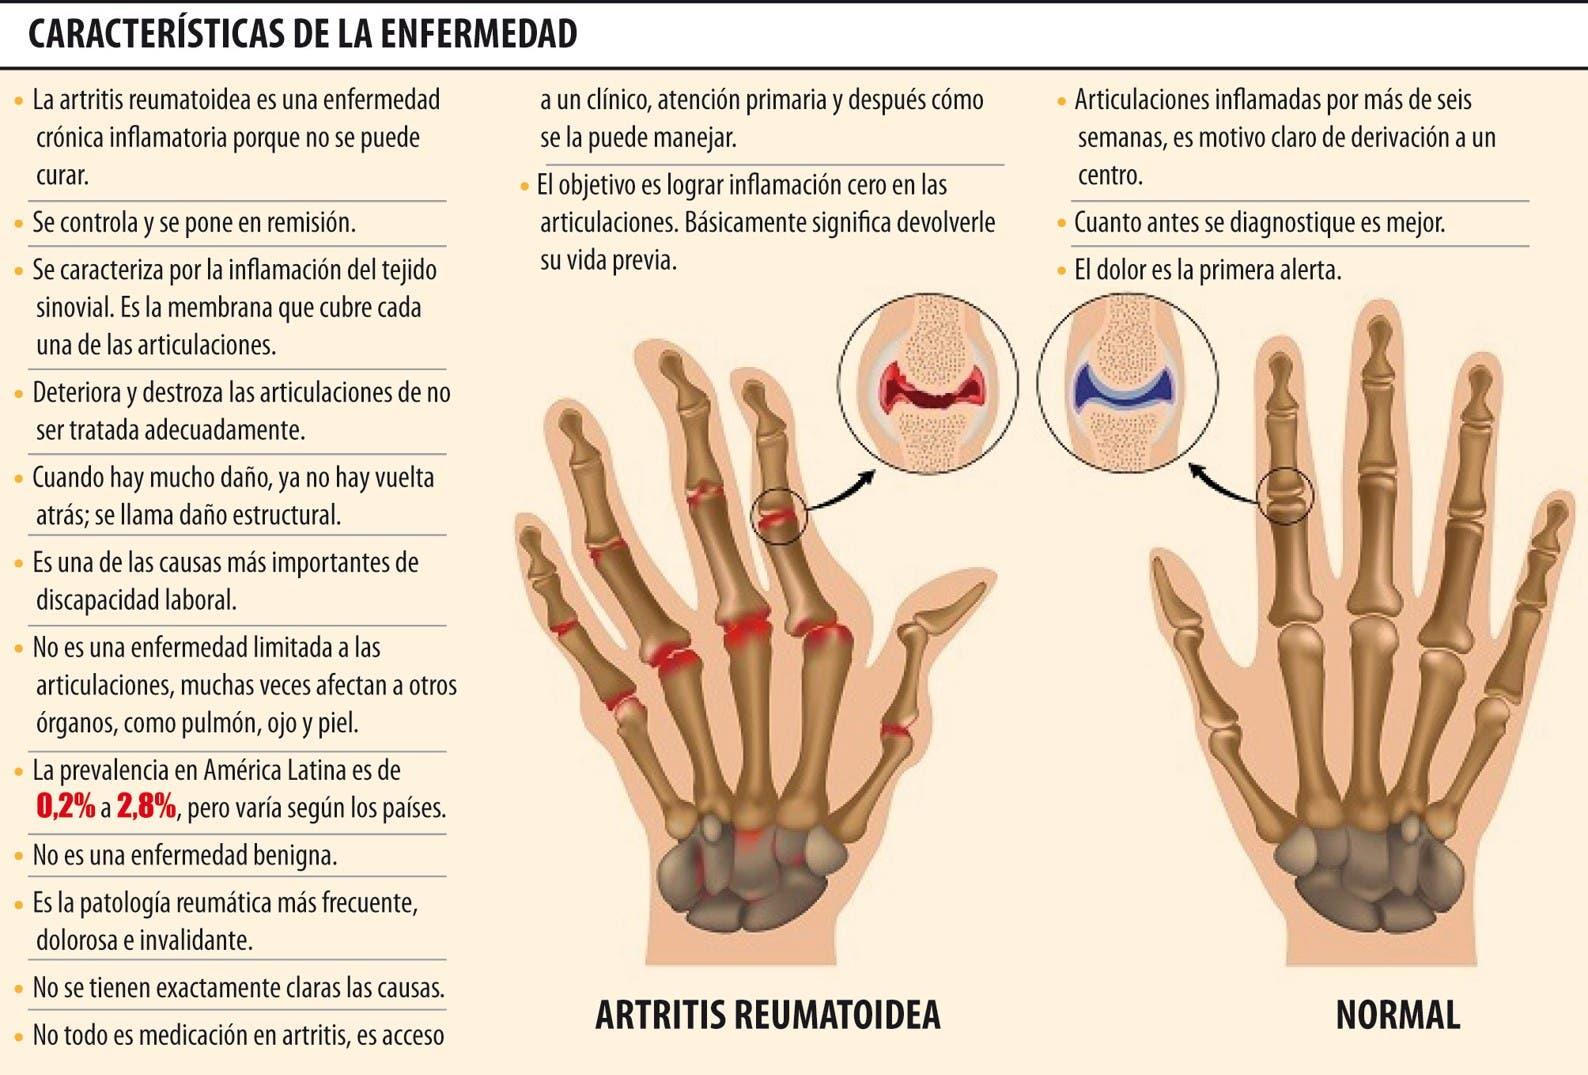 Características de la artritis reumatoide